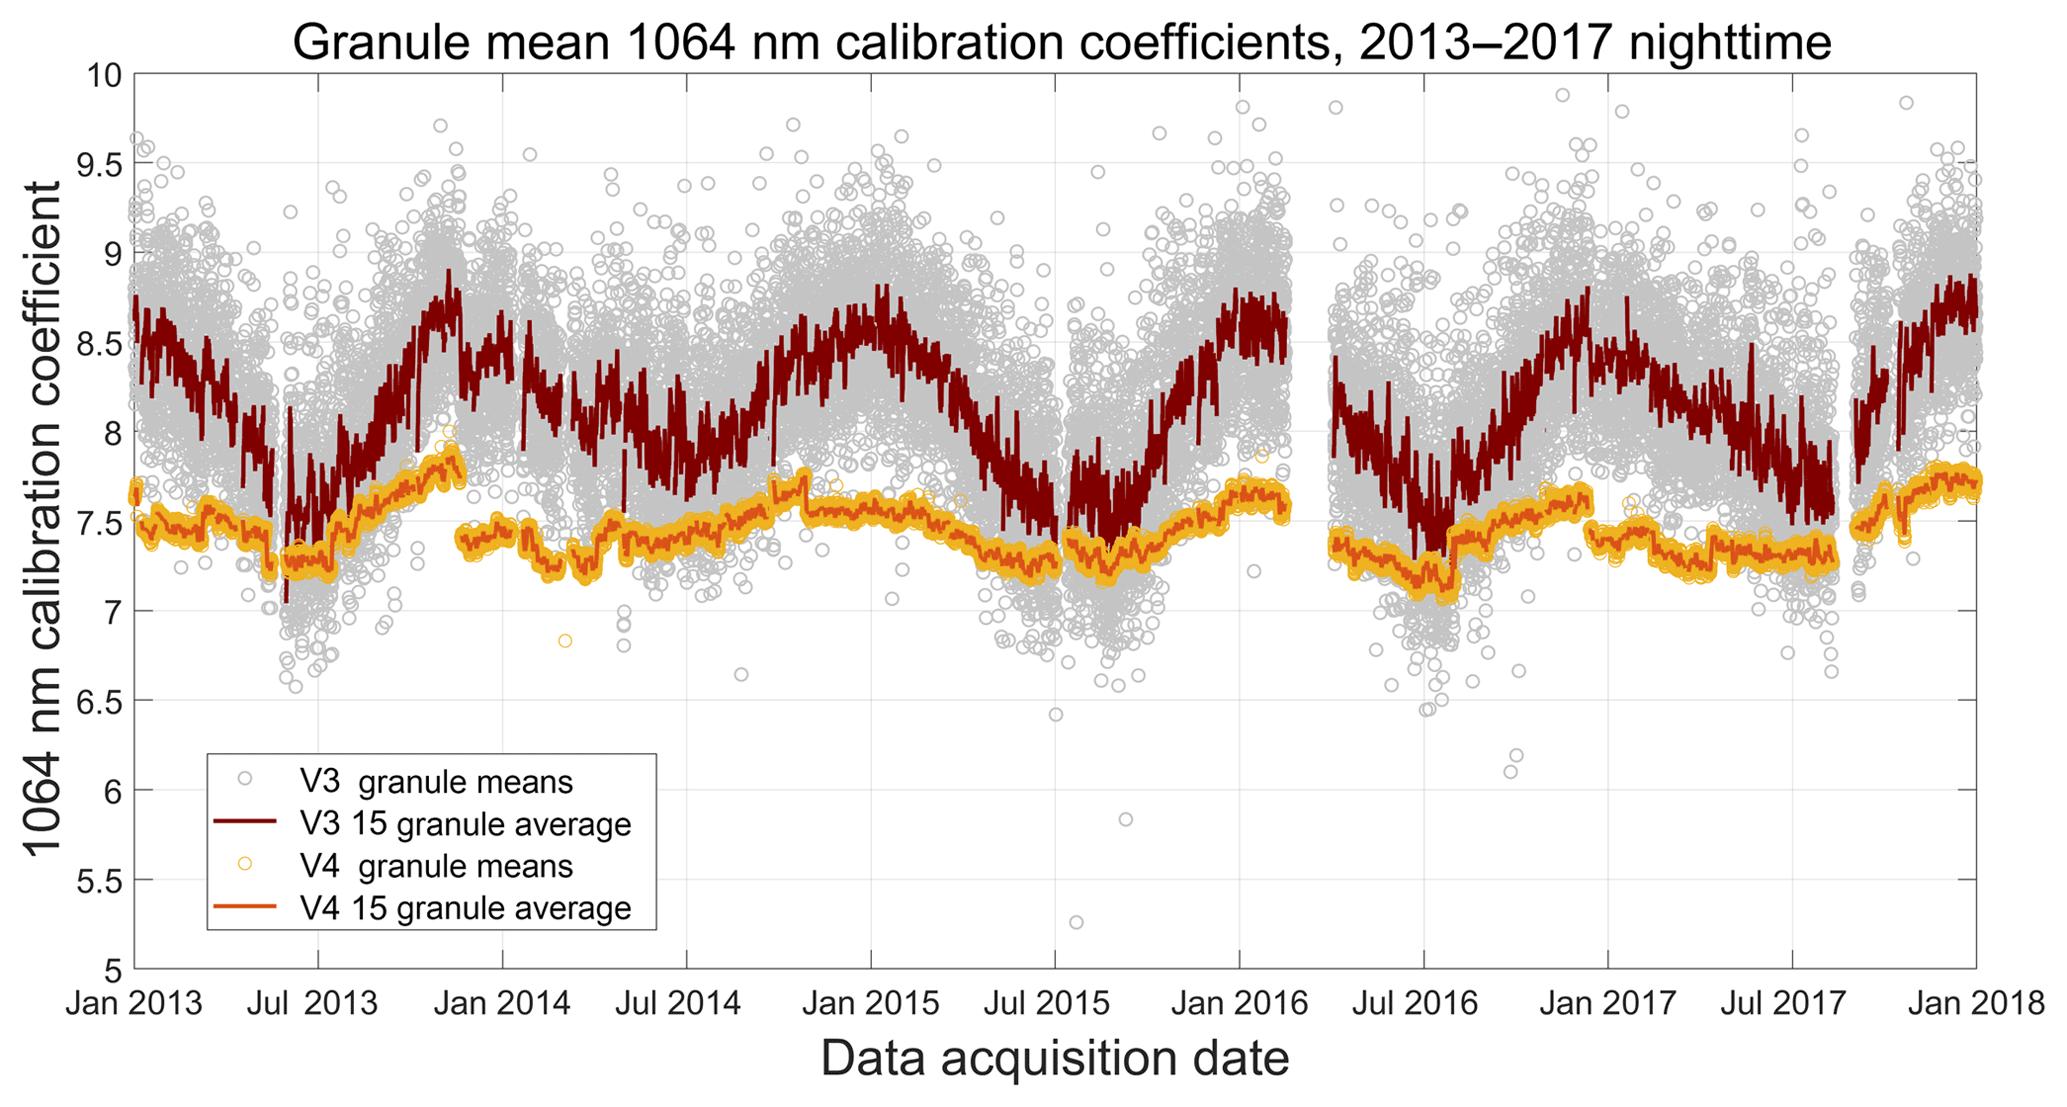 AMT - CALIPSO lidar calibration at 1064 nm: version 4 algorithm